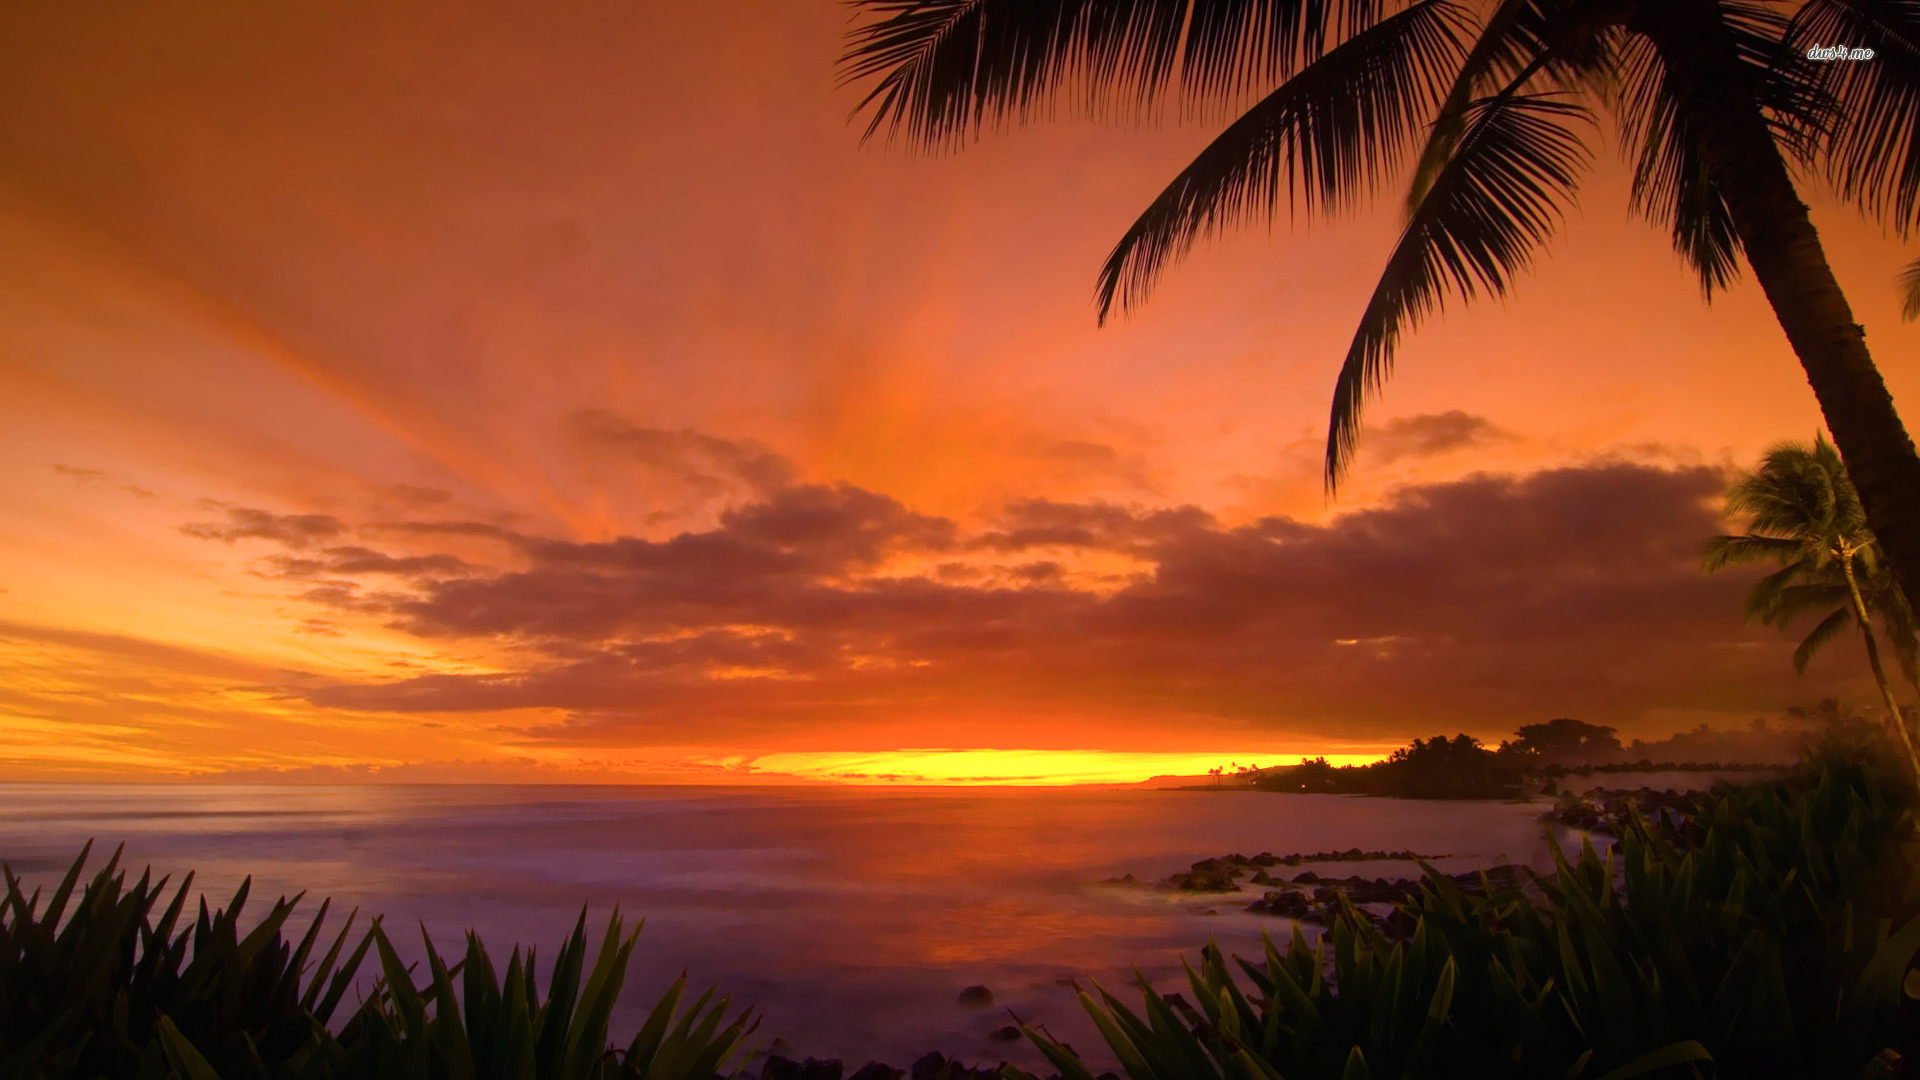 hawaii beach night #3